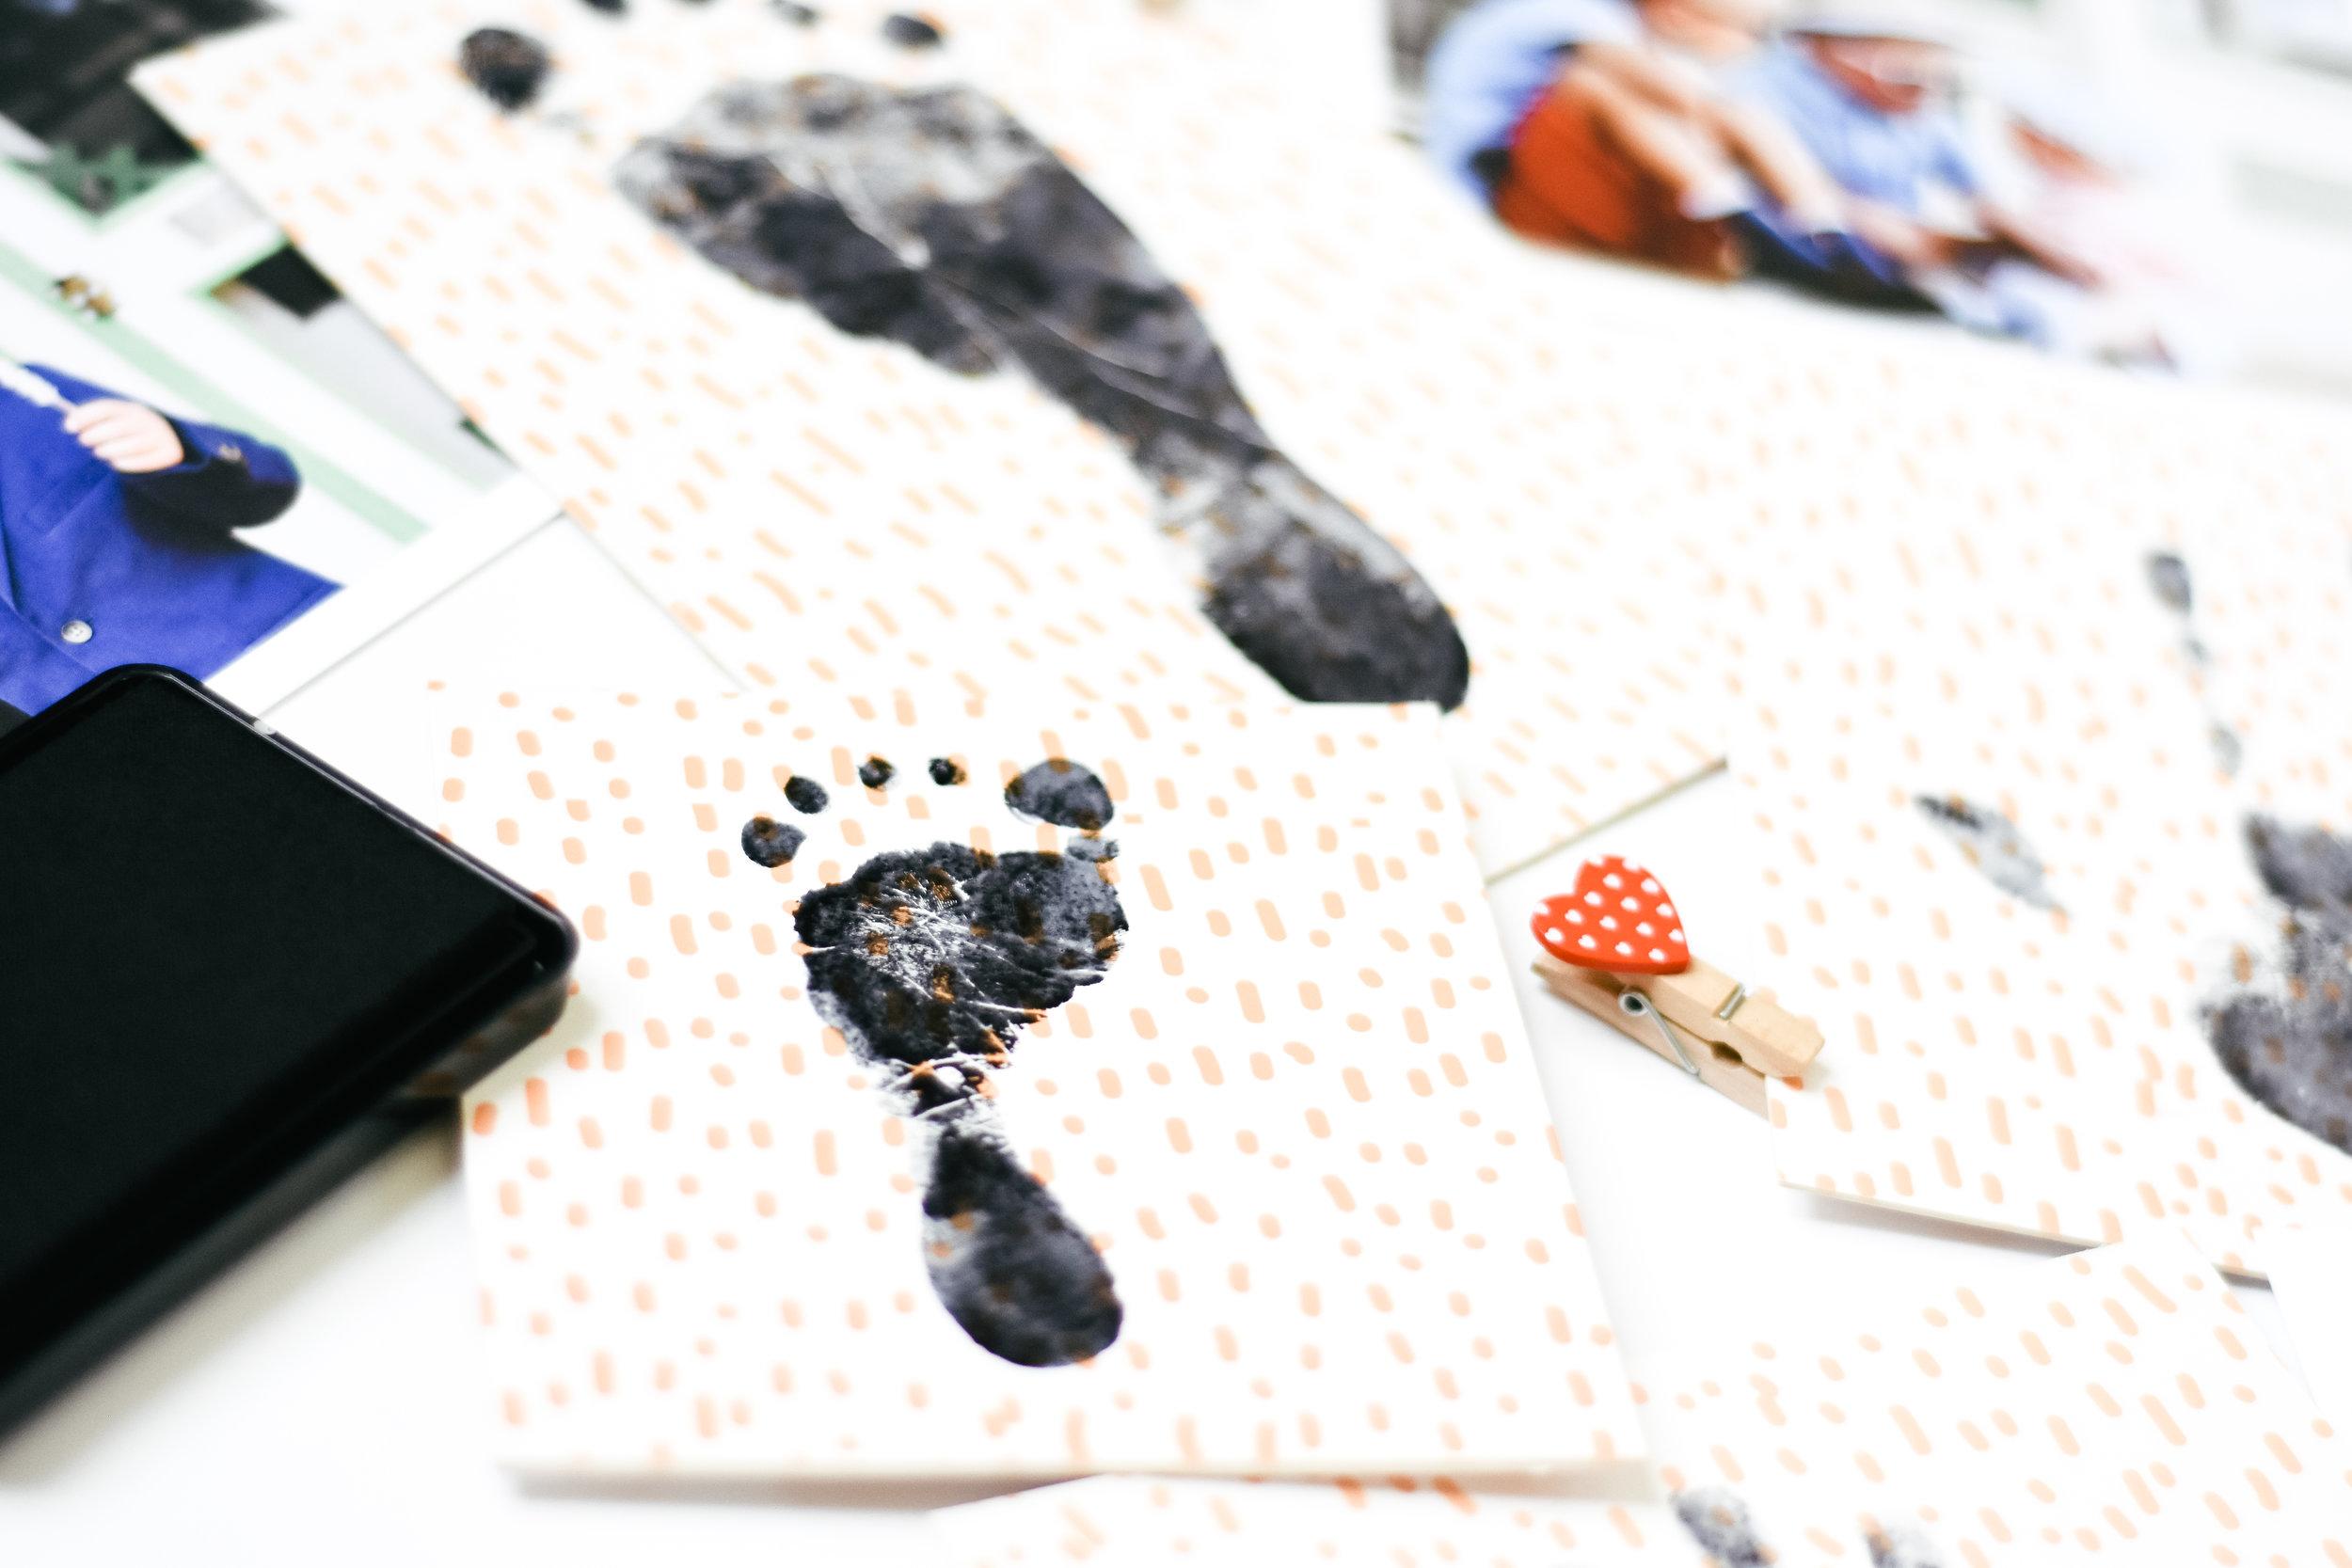 Footprint DIY project